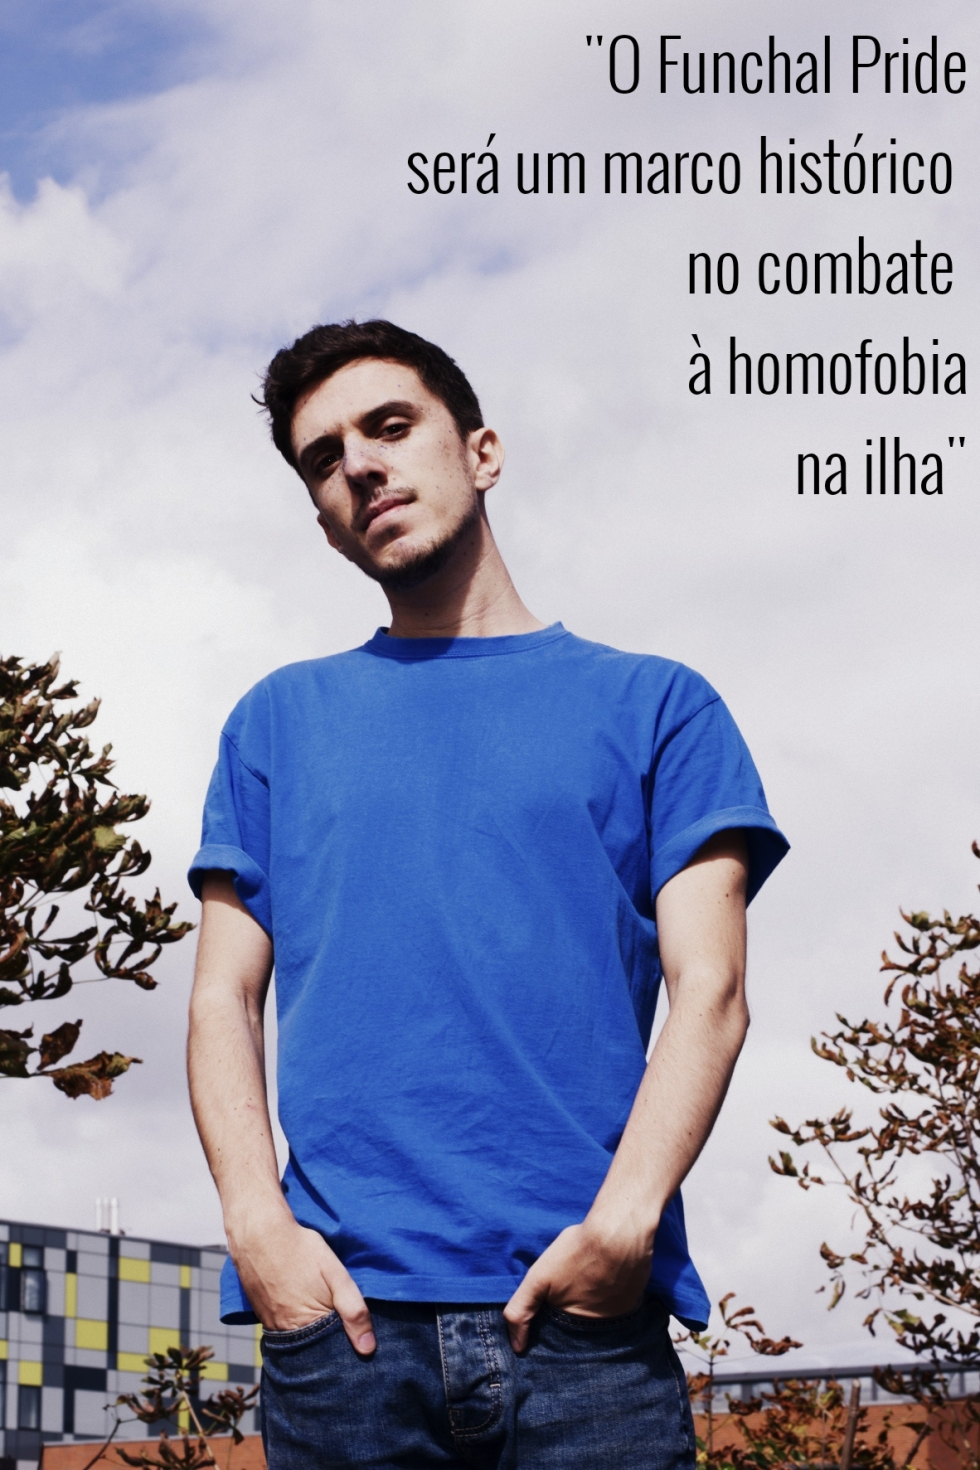 Noun entrevista esqrever cultura música portugal madeira pride funchal 3